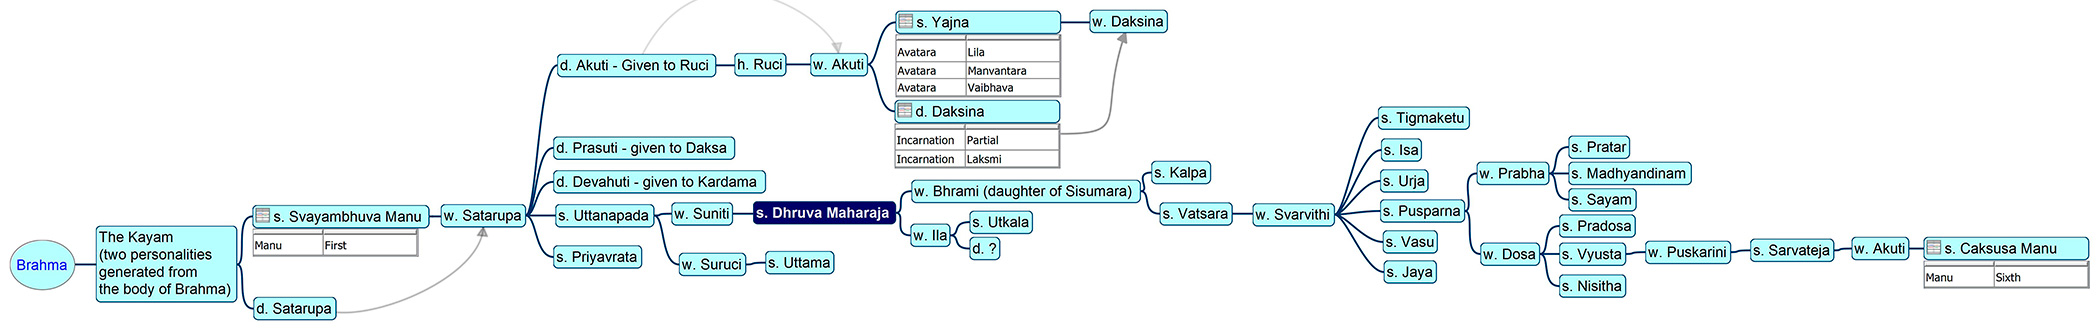 Family tree of Dhruva Mahārāja